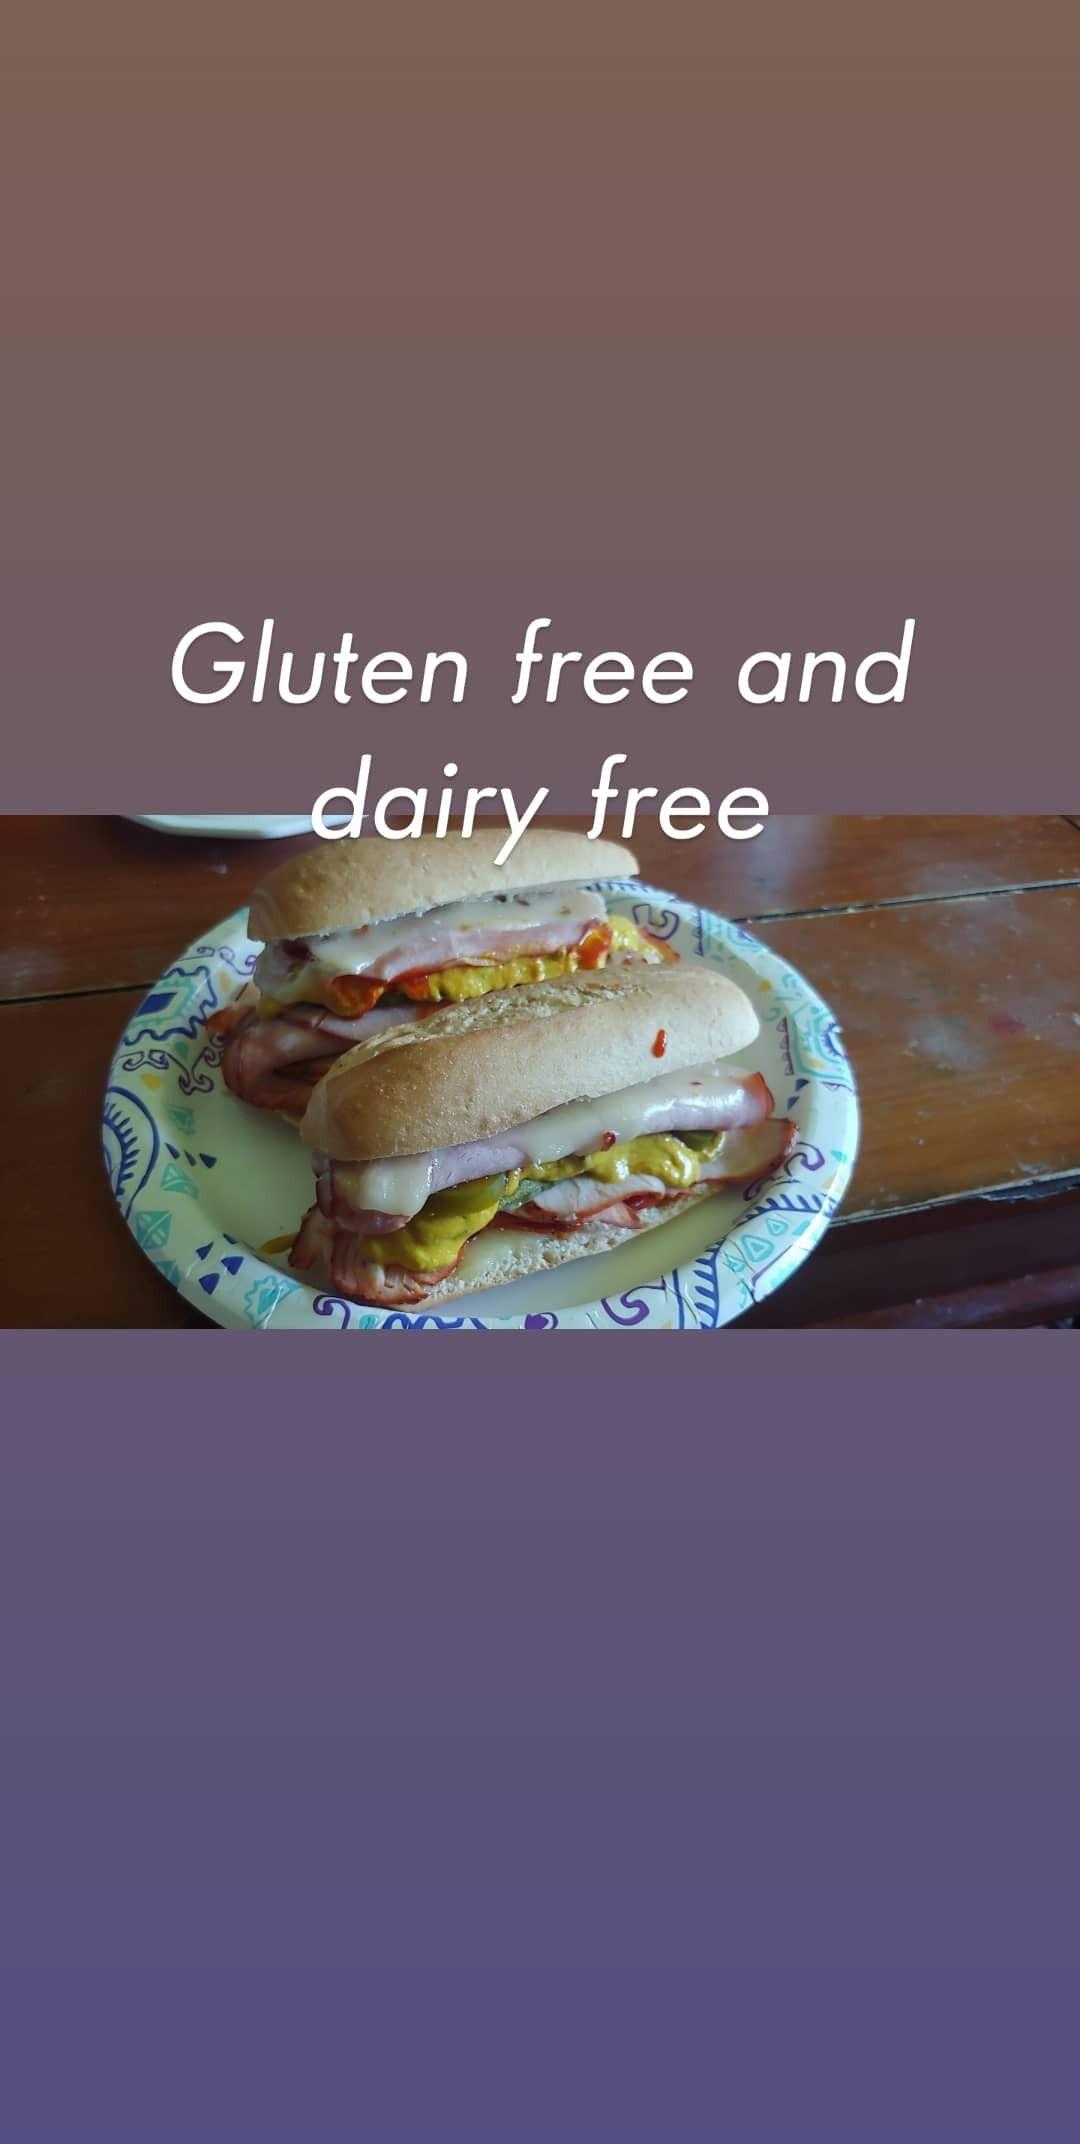 Sub Gluten free dairy free subway wannabe in 2020 Dairy